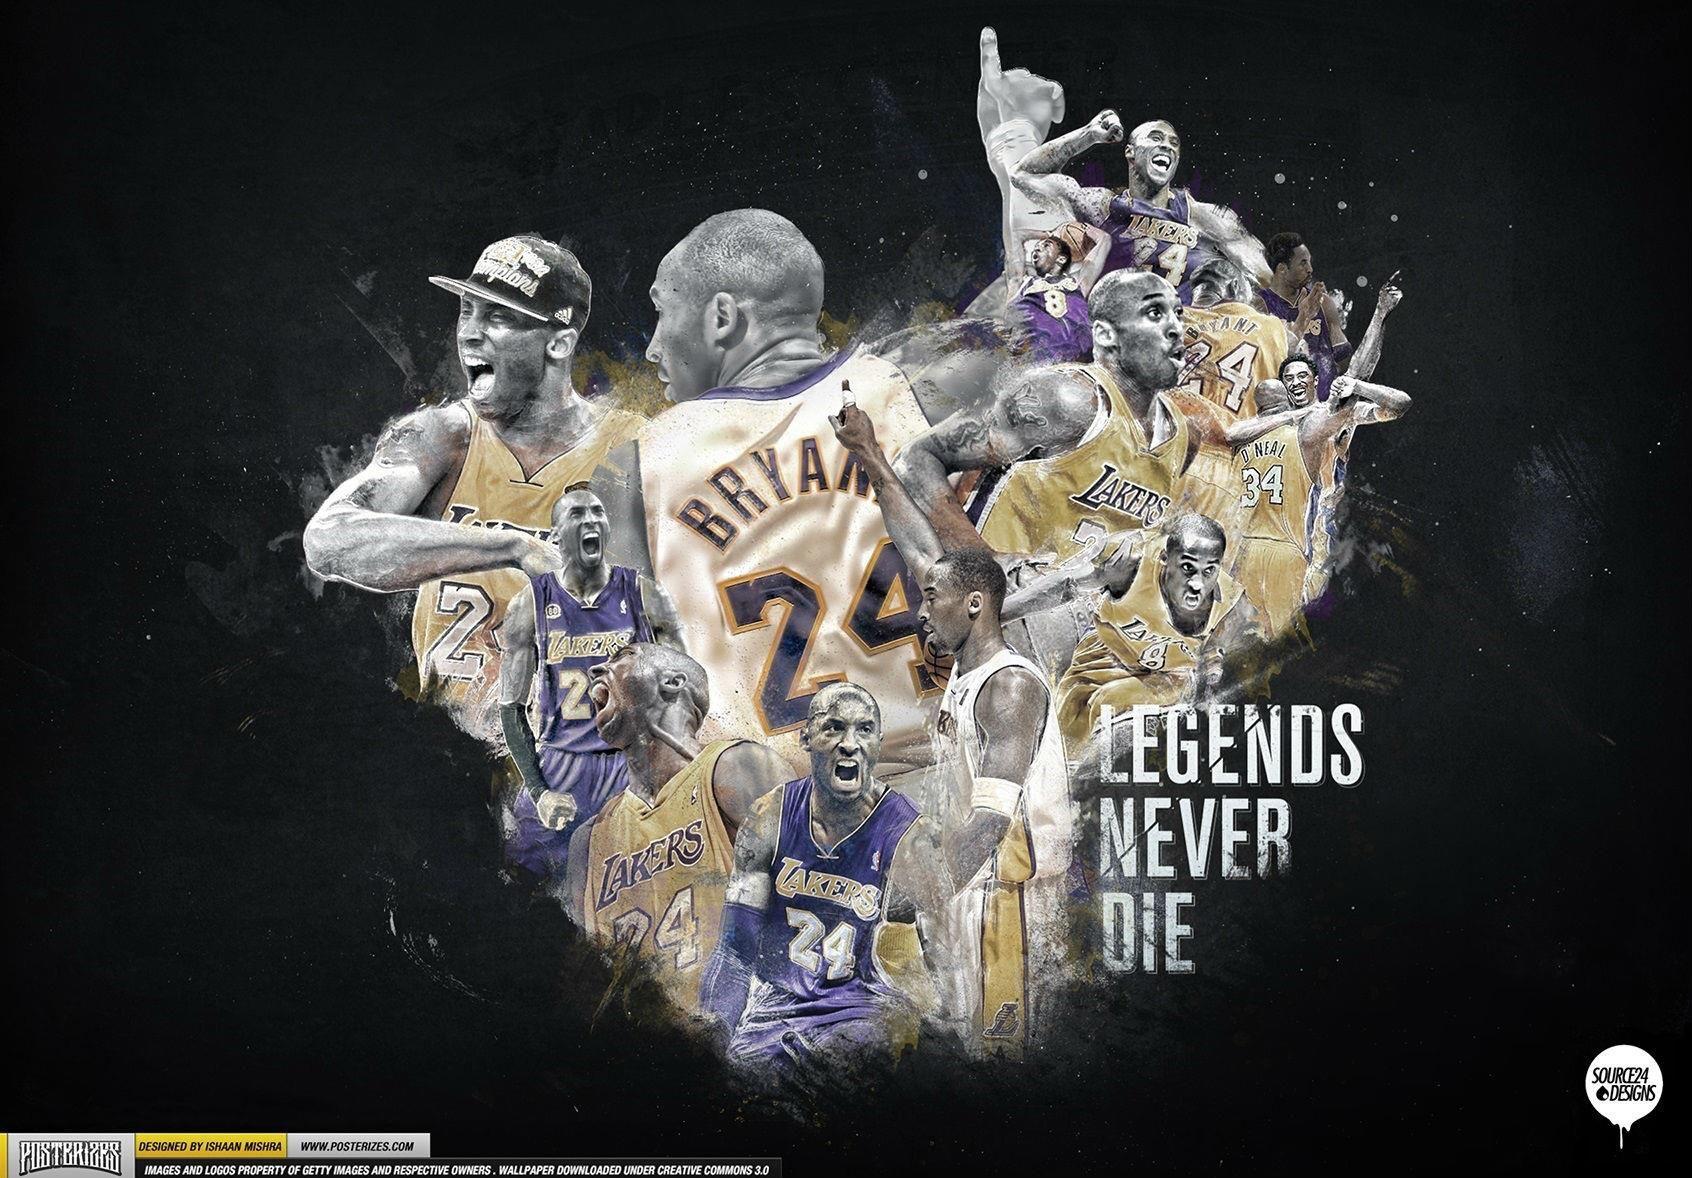 Legends Never Die Kobe Bryant Wallpaper Kobe Bryant Kobe